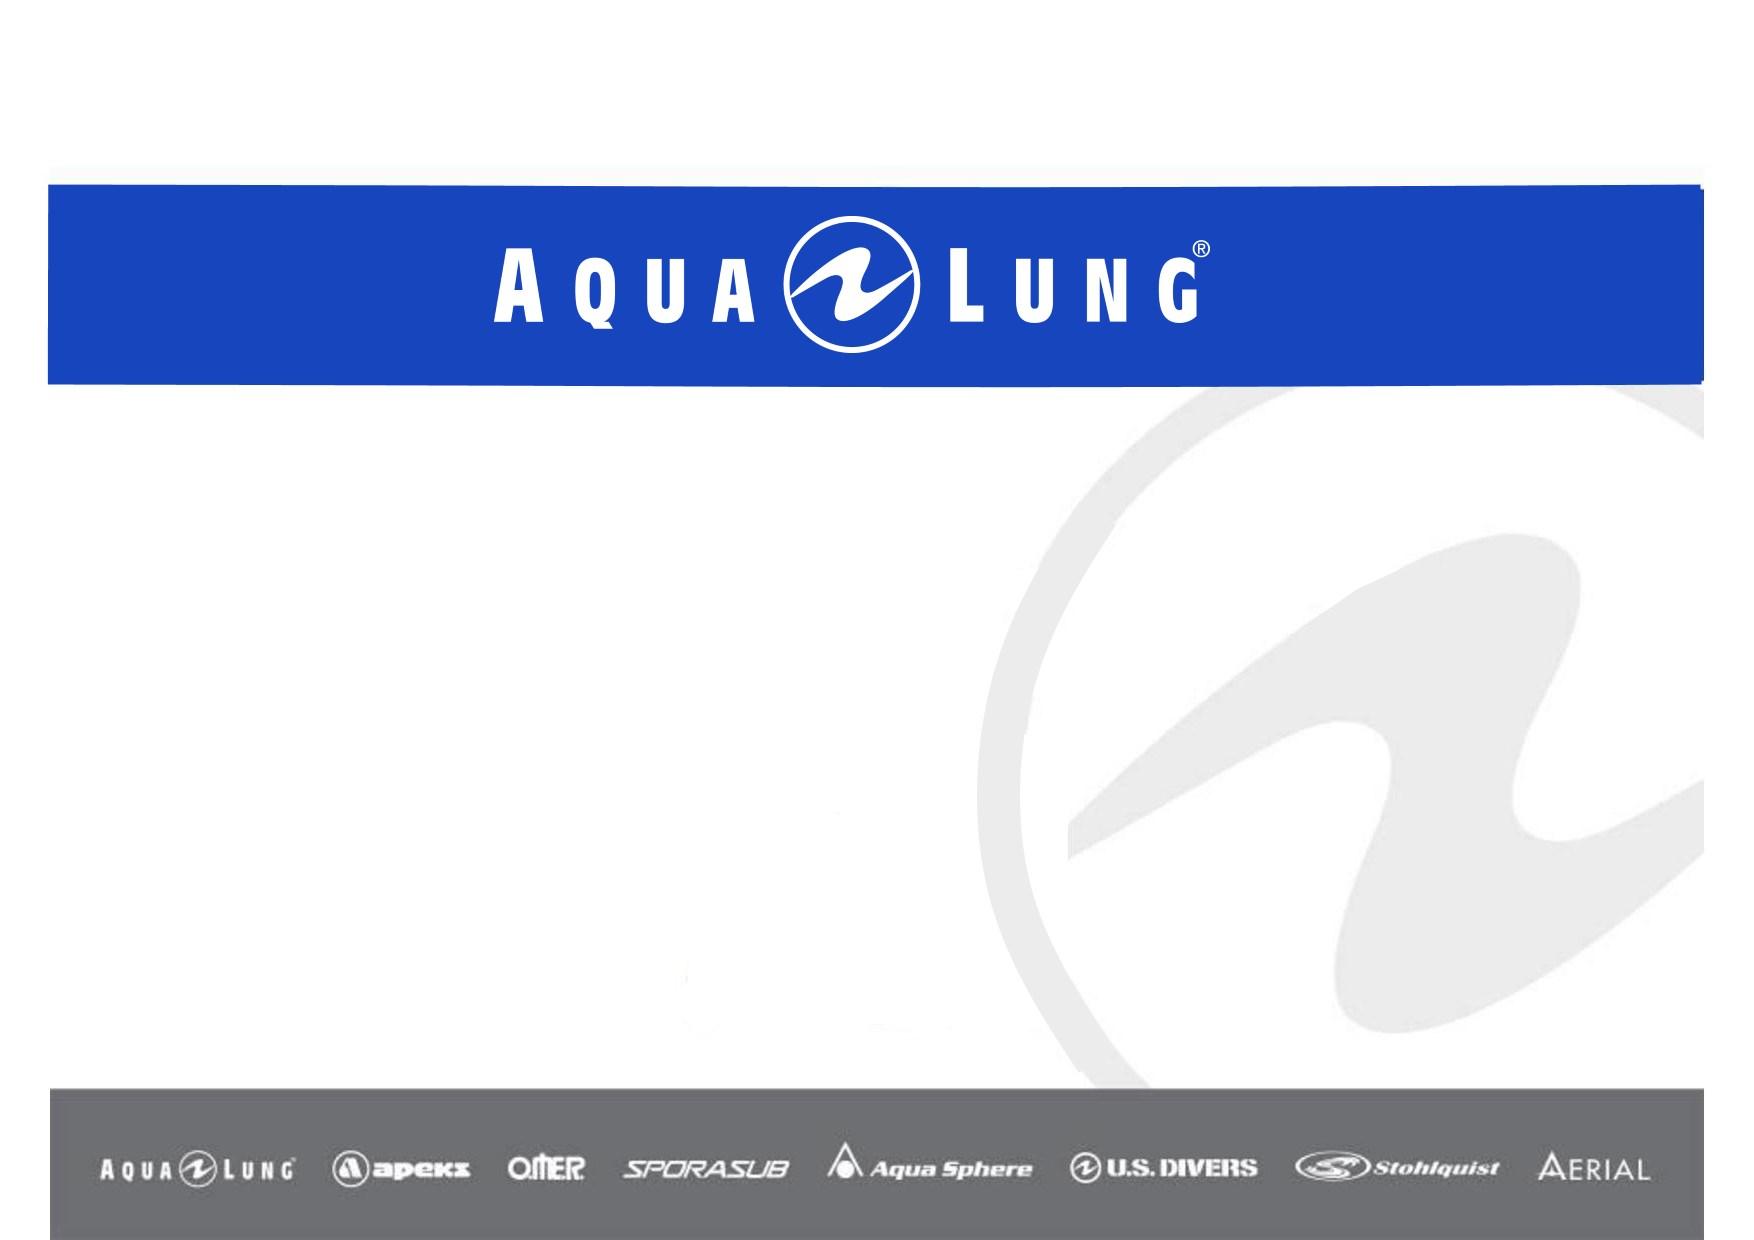 Aqualung bakgrunn